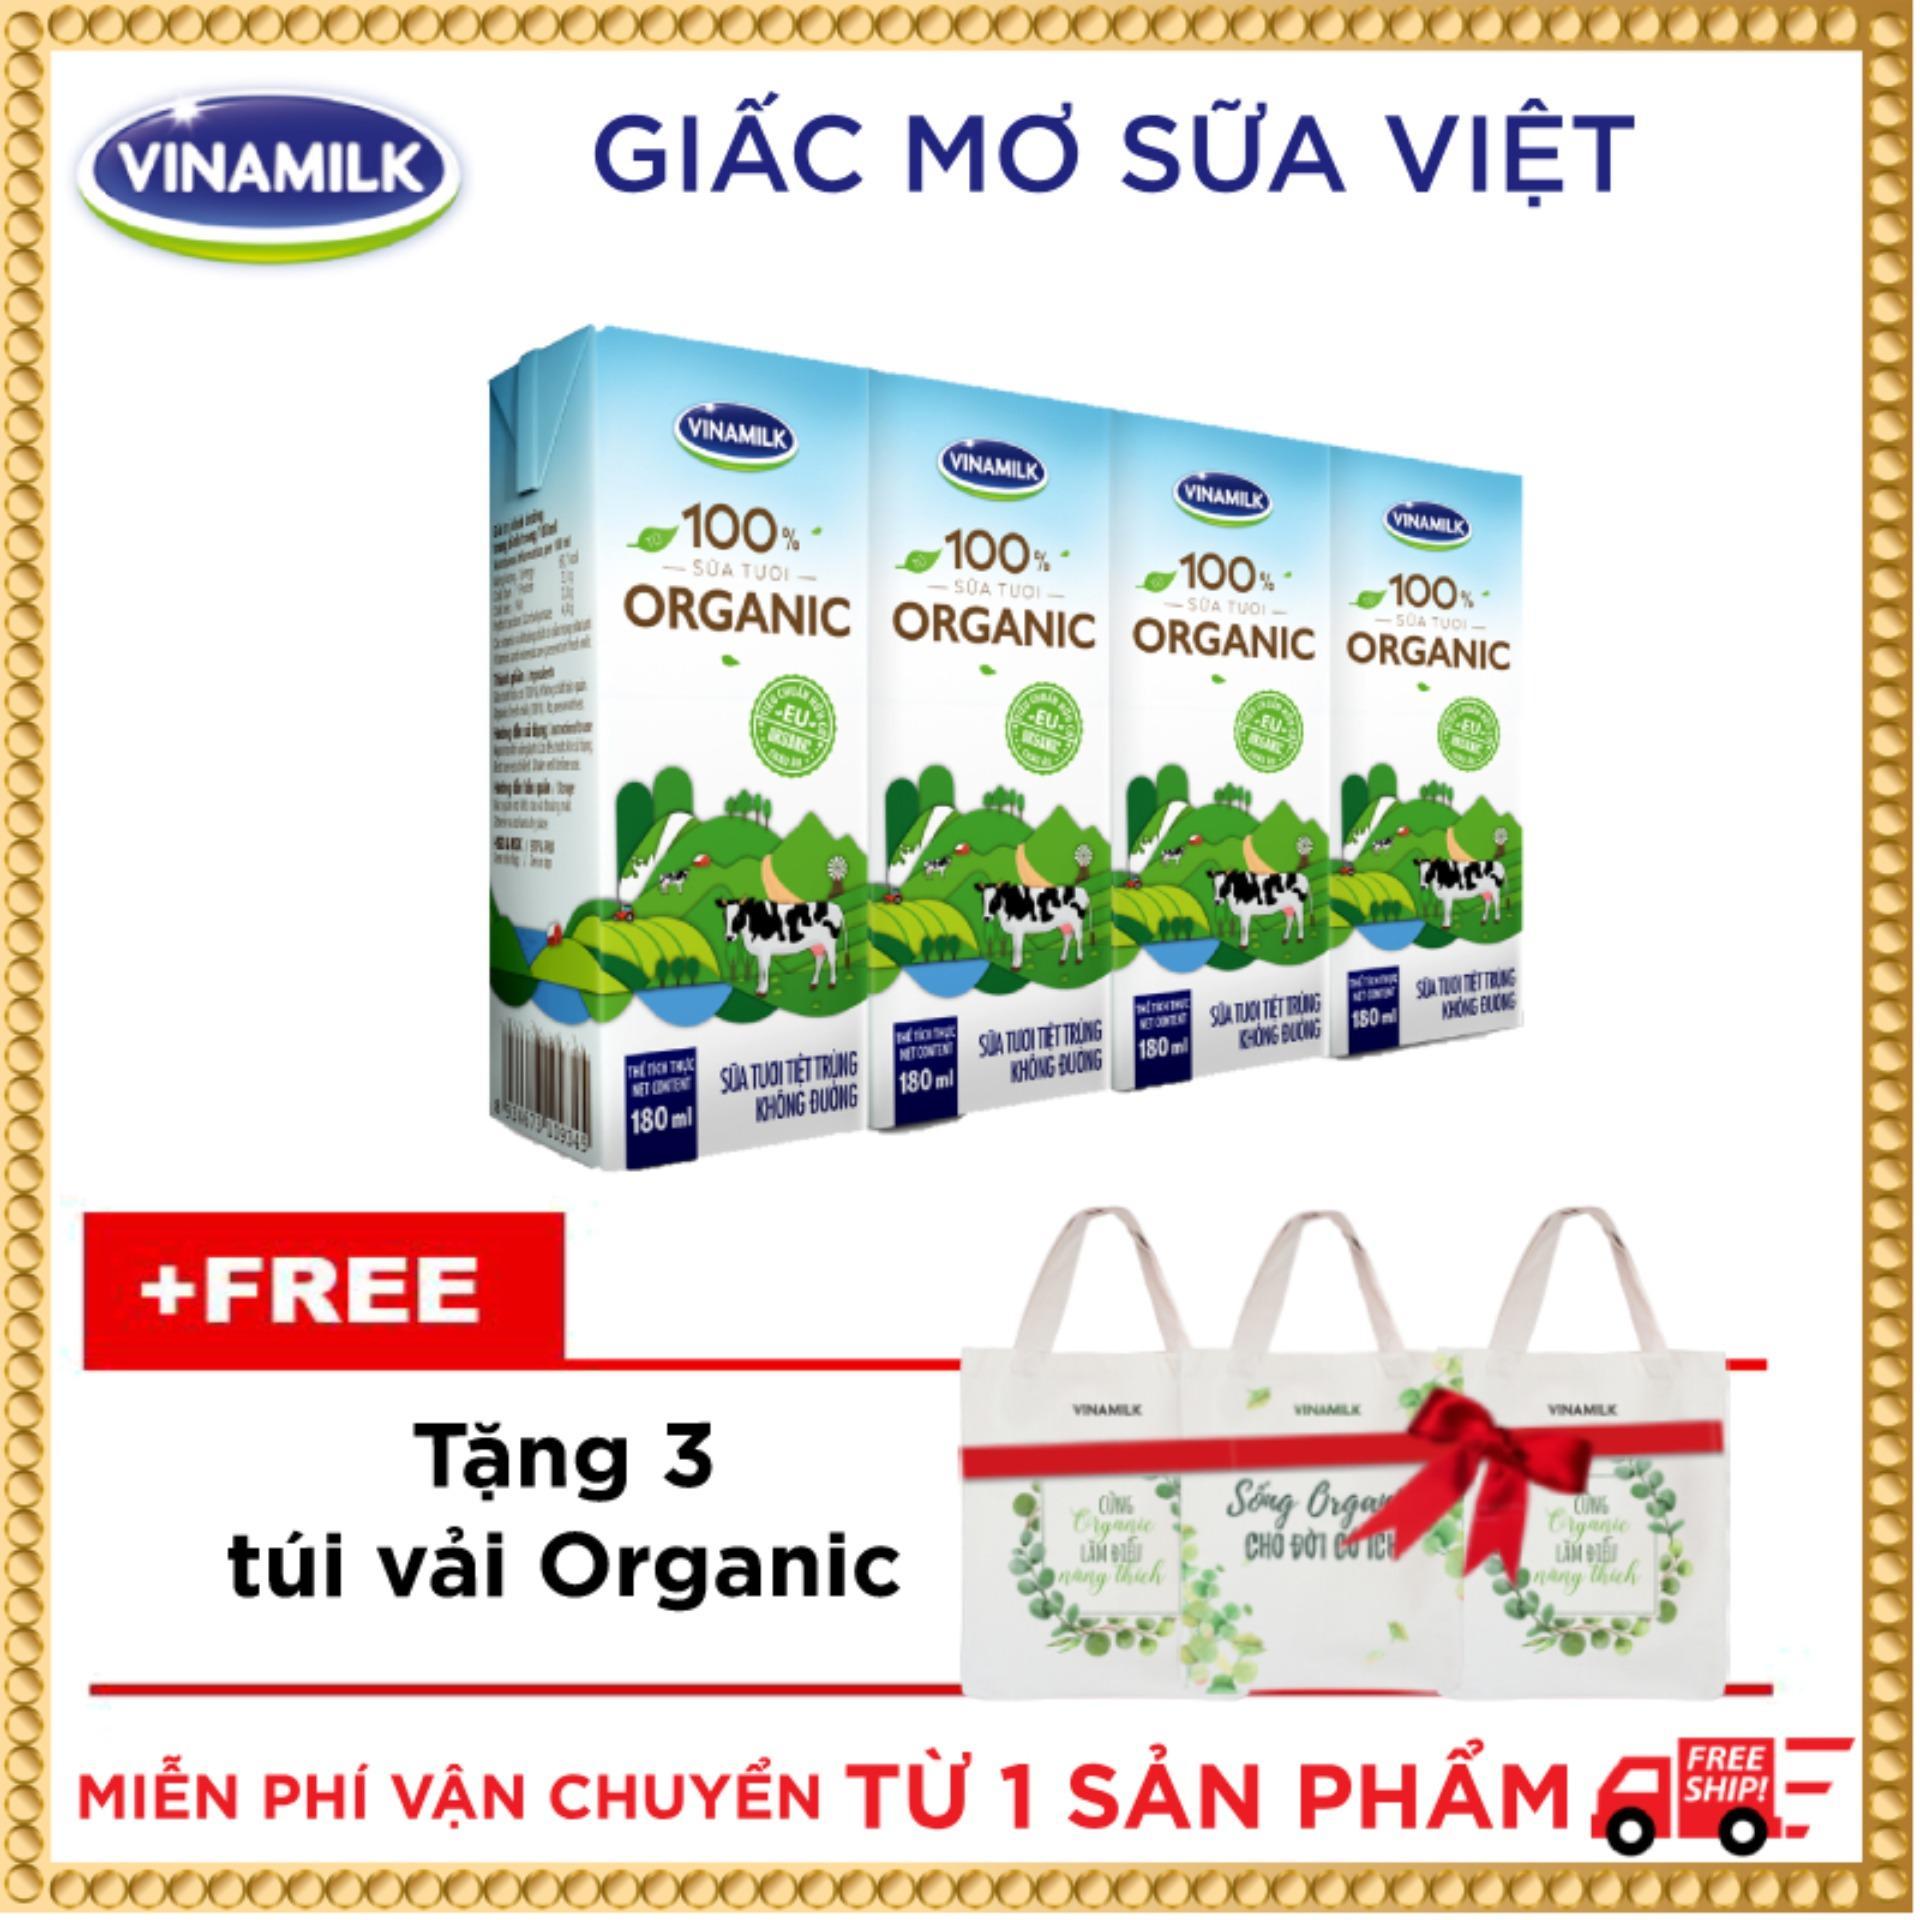 Bộ 36 hộp Sữa tươi Vinamilk 100% Organic 180ml_Tặng 3 túi vải Organic